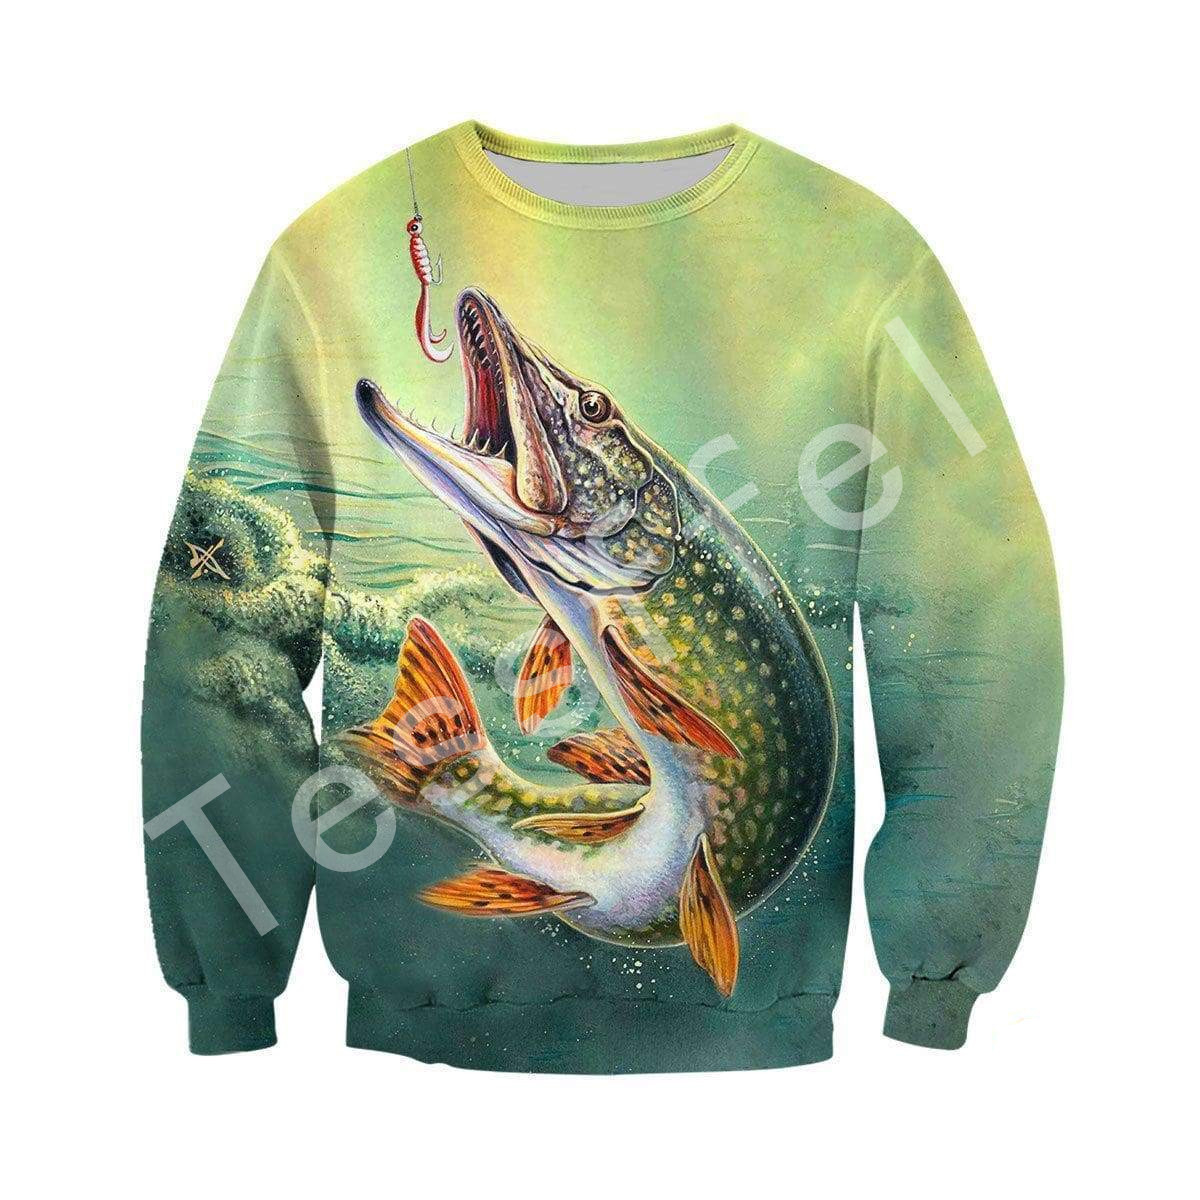 Tessffel animal deep fishing casual 3D Printed Hoodie Sweatshirt Jacket shirts Mens Womens HIP HOP fit colorful Harajuku style 5 in Hoodies amp Sweatshirts from Men 39 s Clothing